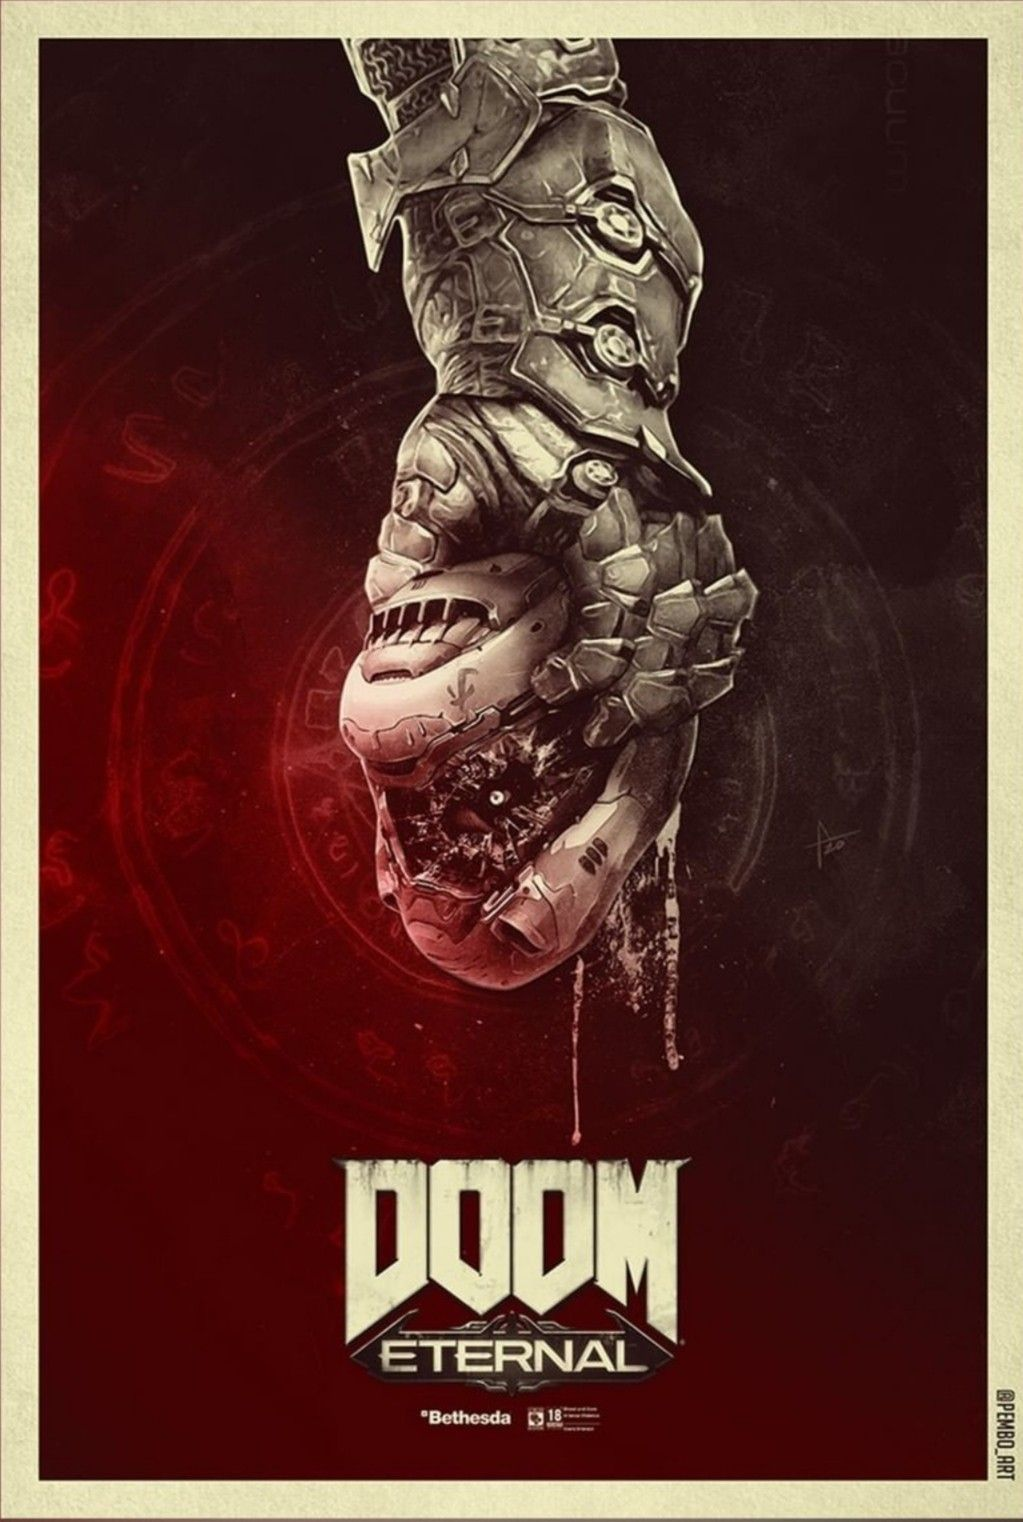 Doom Ultimate Gaming Prints Wall Art Gift Idea Gamers Art Poster A5 A4 A3 A2 A1